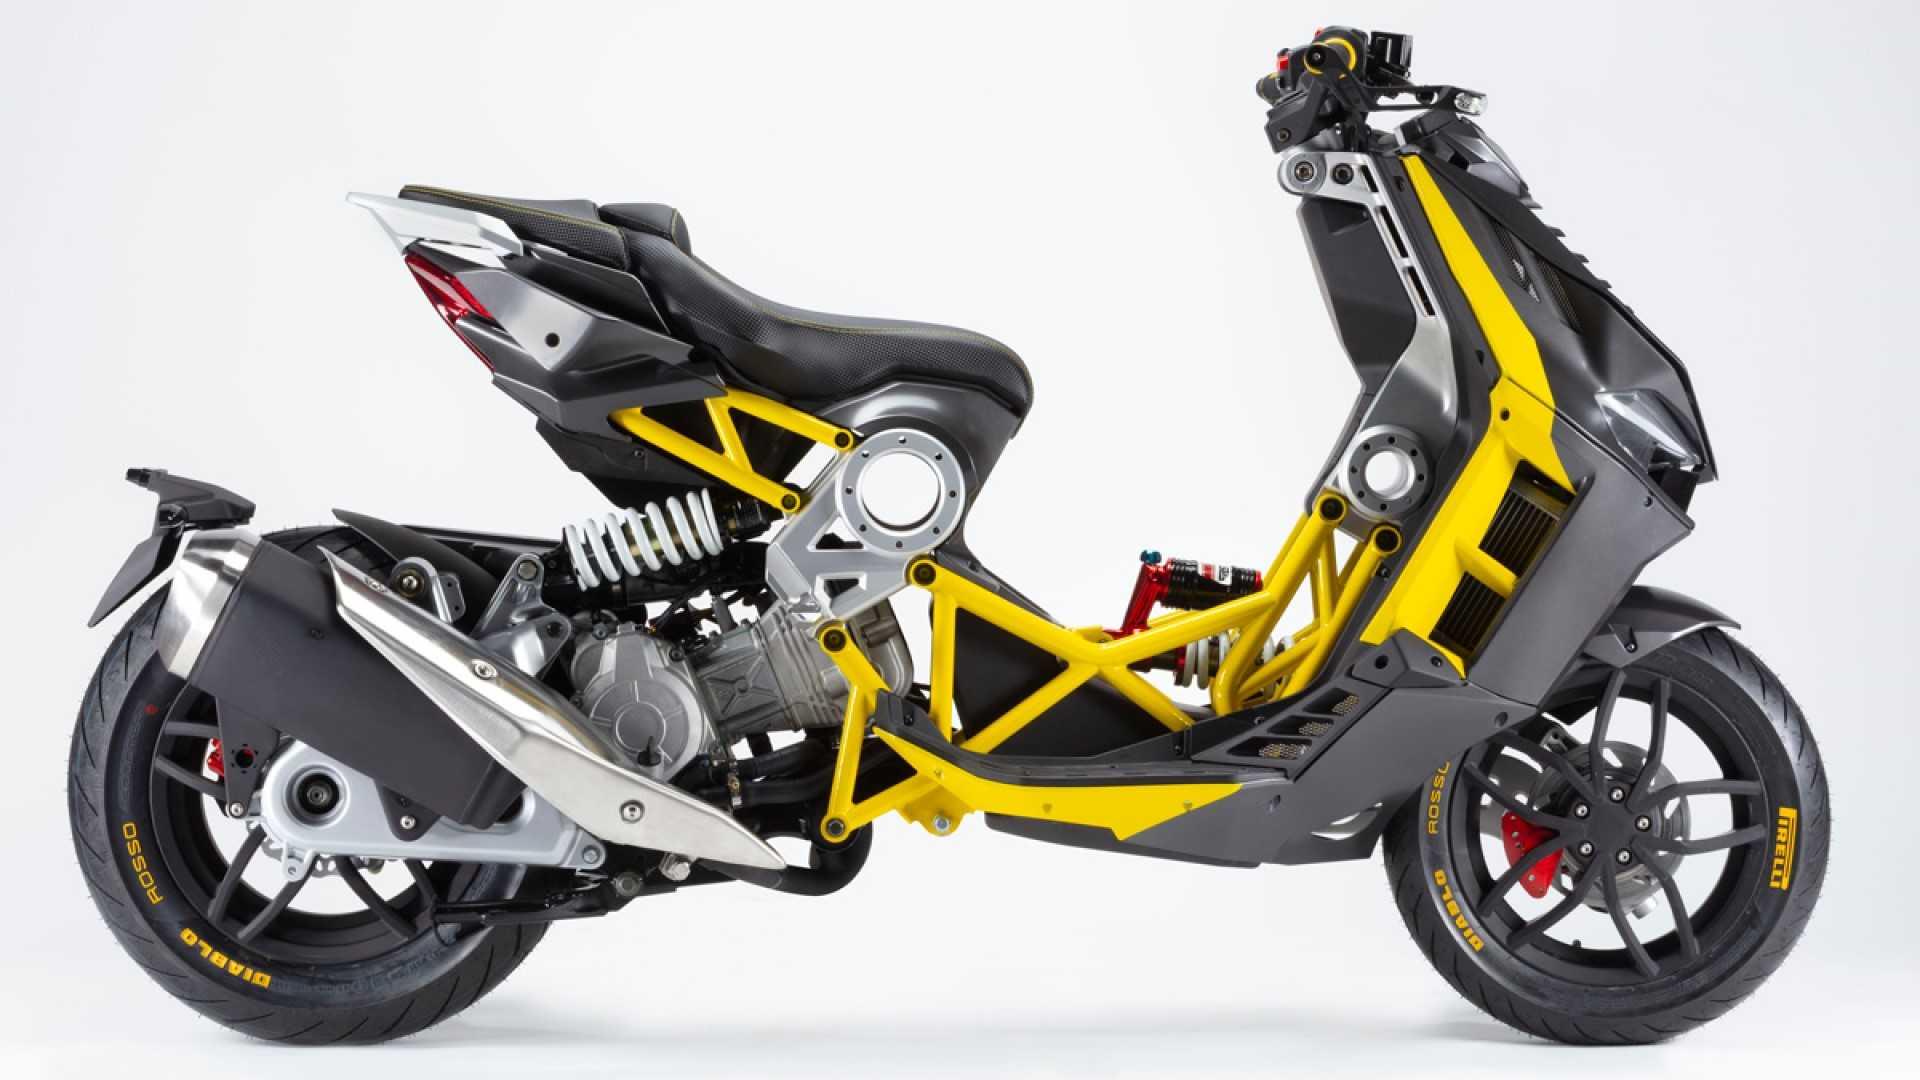 2019-italjet-dragster-4